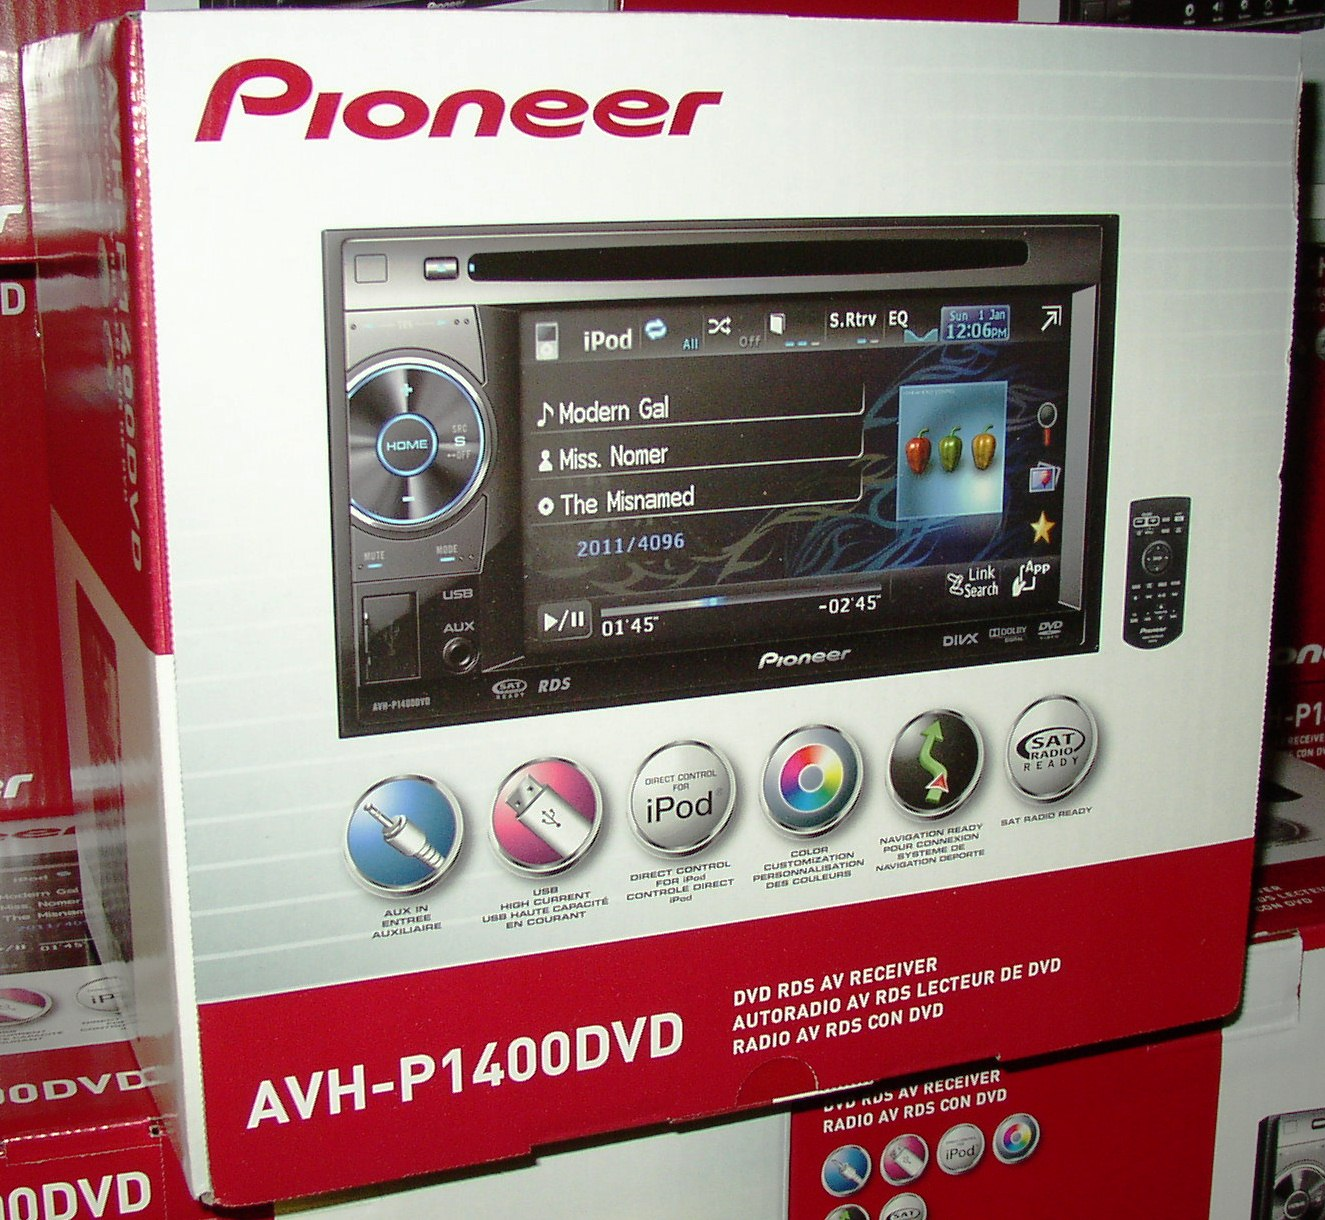 Pioneer Dvd Wiring Diagrams Pandora Harness Diagram Avh P1400dvd Cd Receiver 5 8 Lcd New Stereo